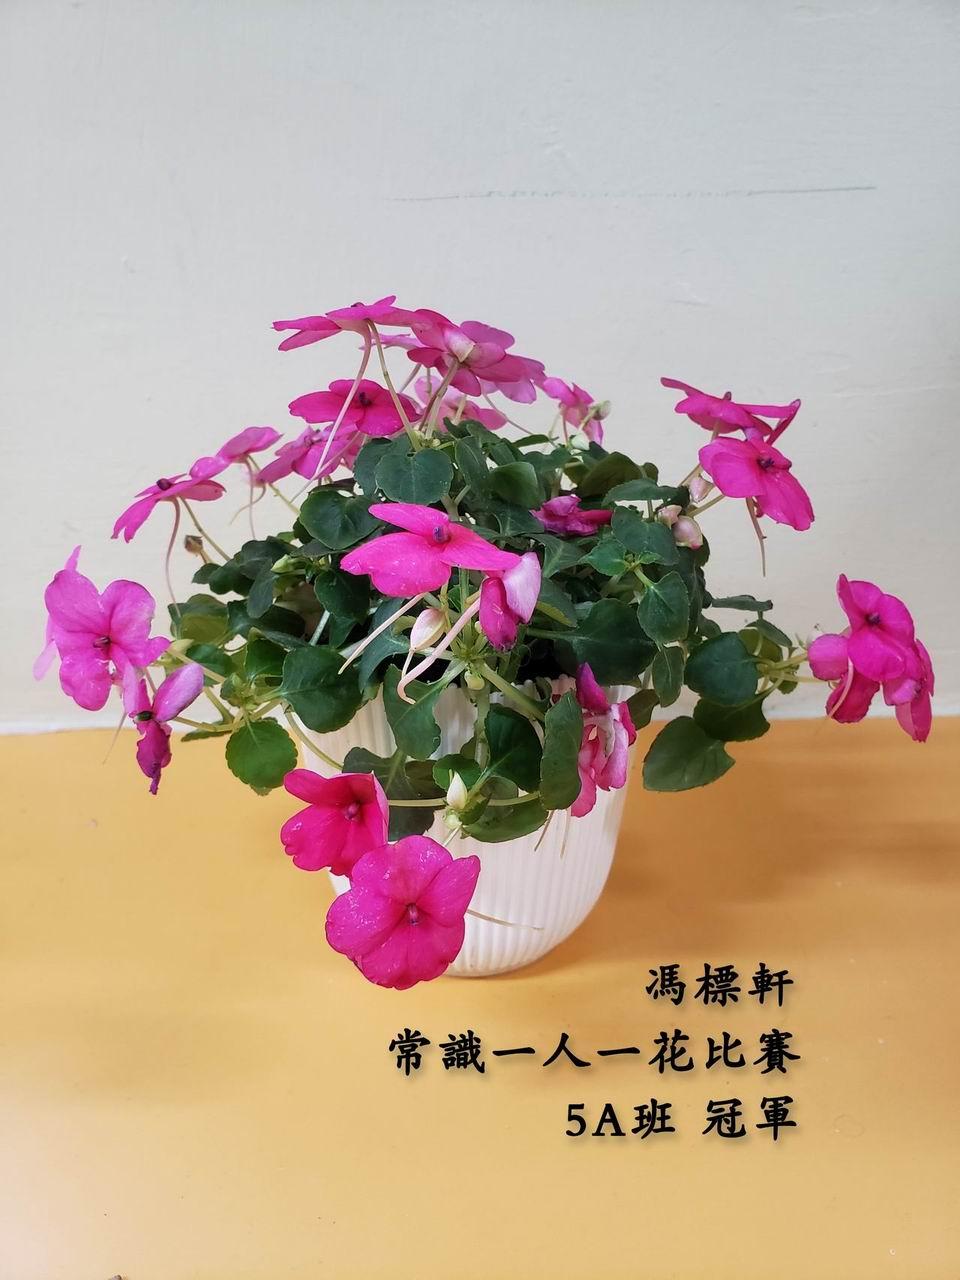 https://www.plkcjy.edu.hk/sites/default/files/diao_zheng_da_xiao_5a_guan_.jpg